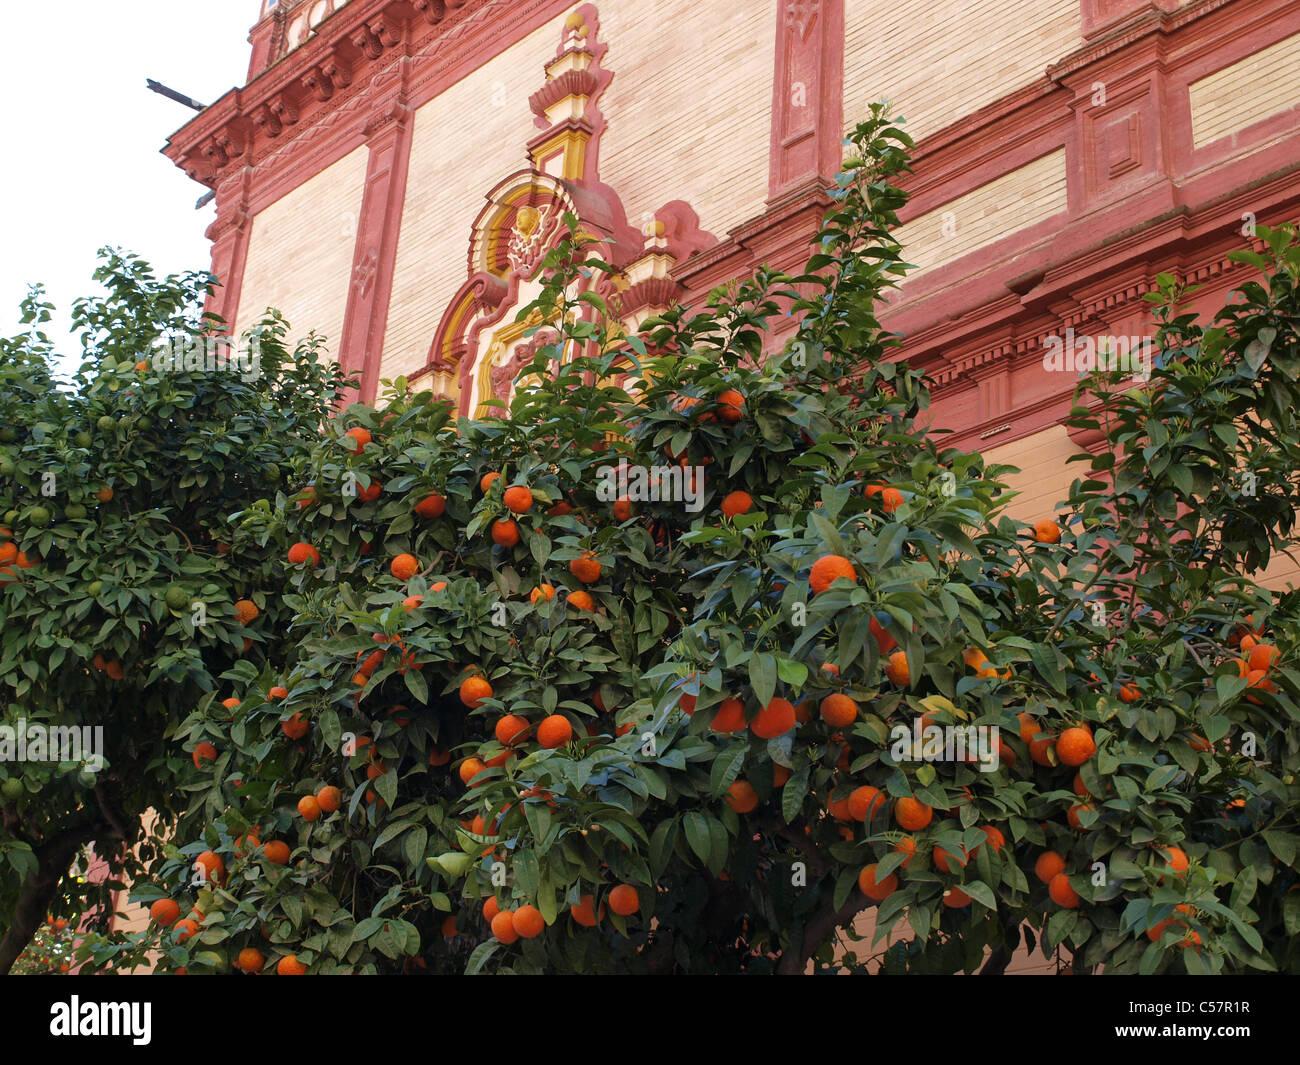 Orange trees in Seville, Spain. - Stock Image